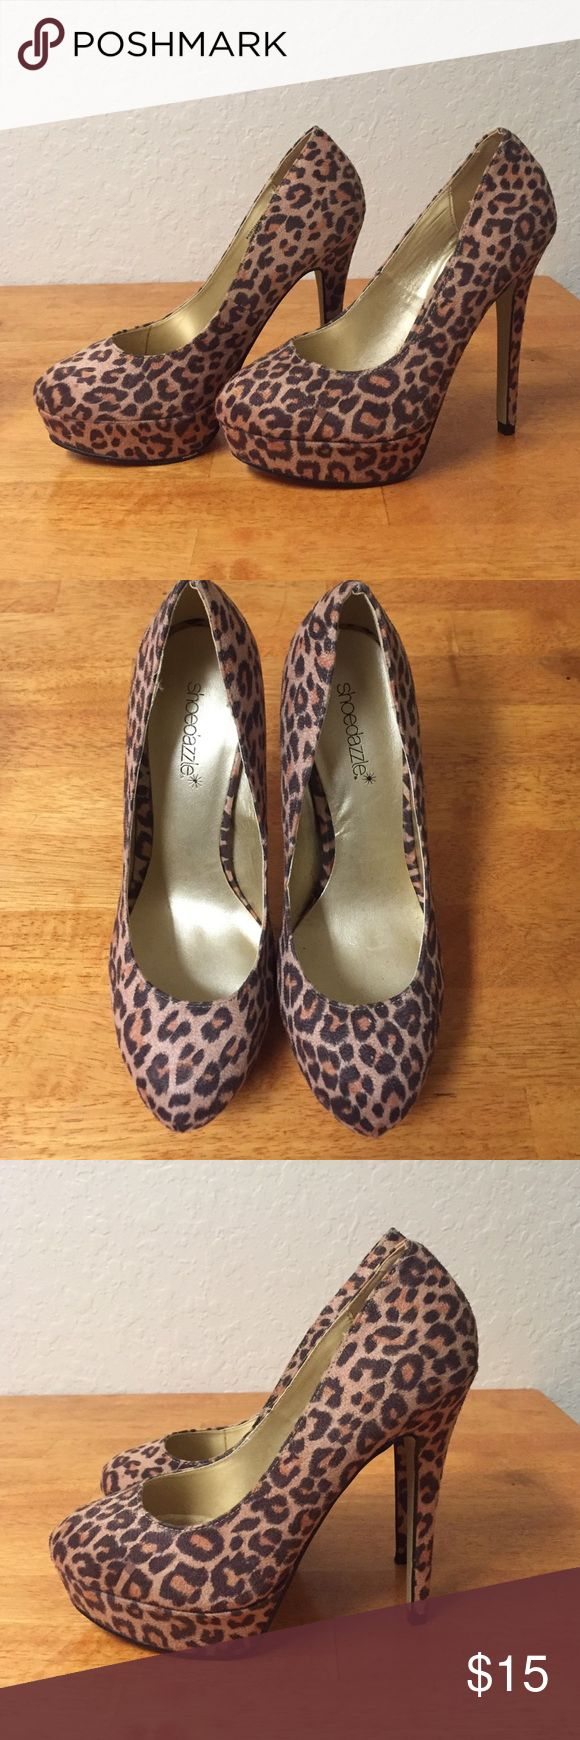 Shoe Dazzle leopard heels Worn once, leopard heels with an inch platform. US 6, UK 4, EU 36 Shoe Dazzle Shoes Heels